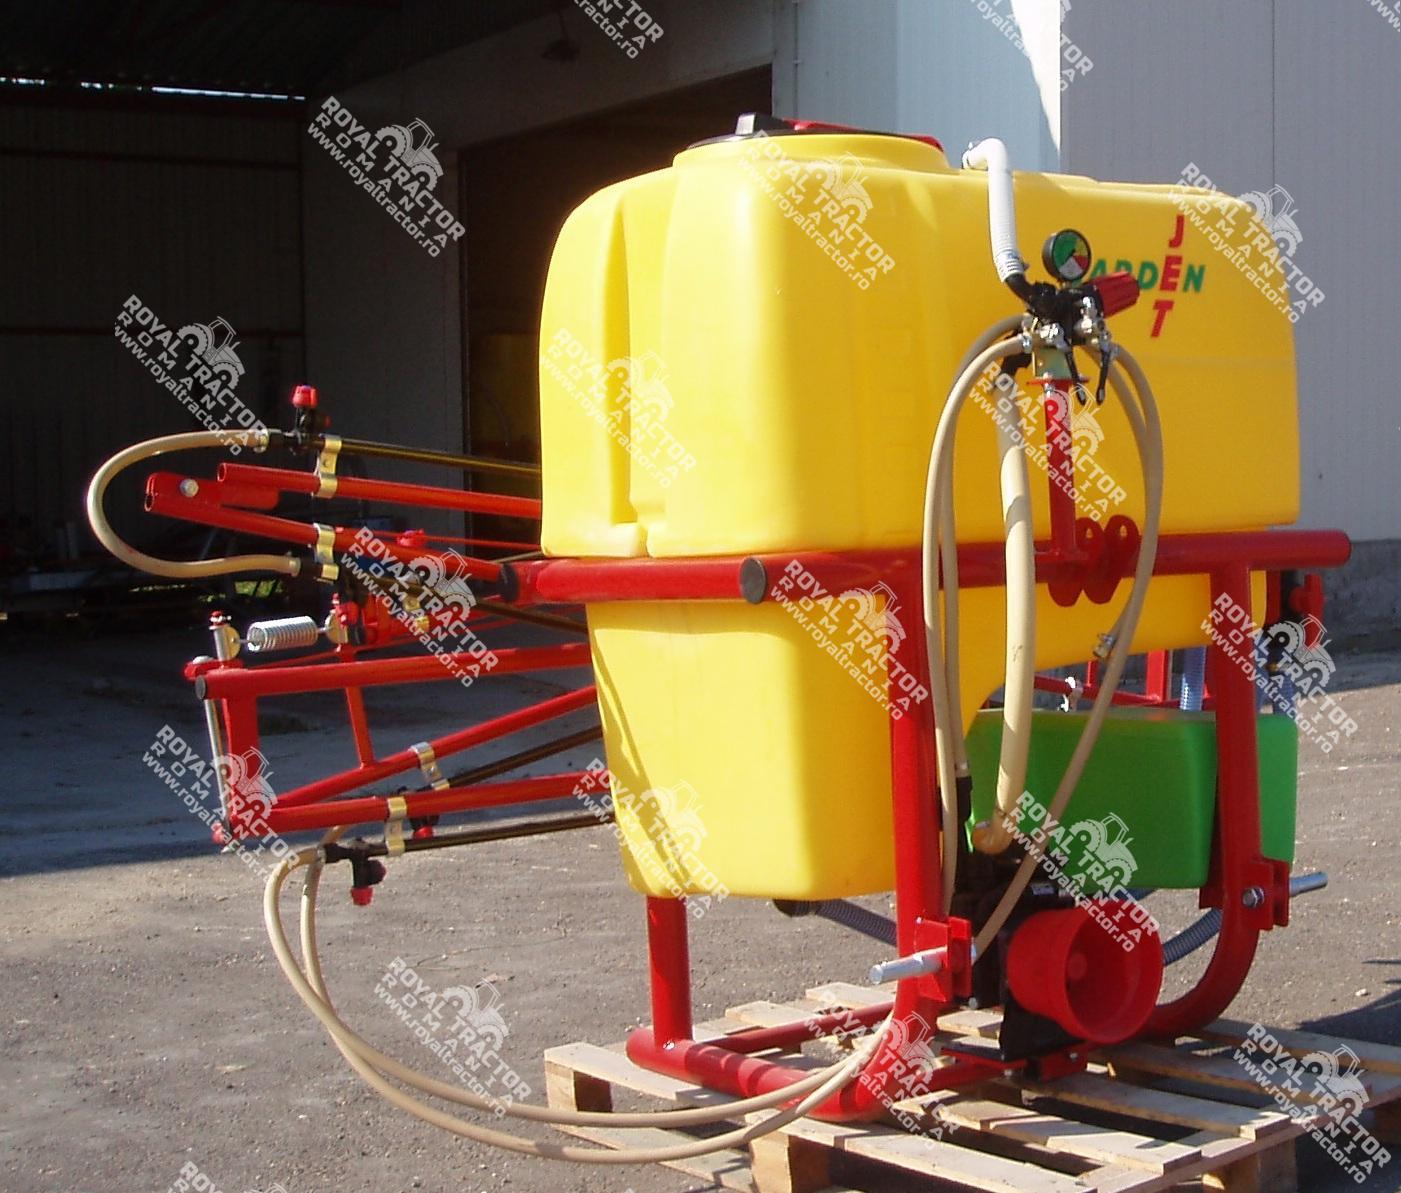 G-JET 400 / 12 mrx permetező